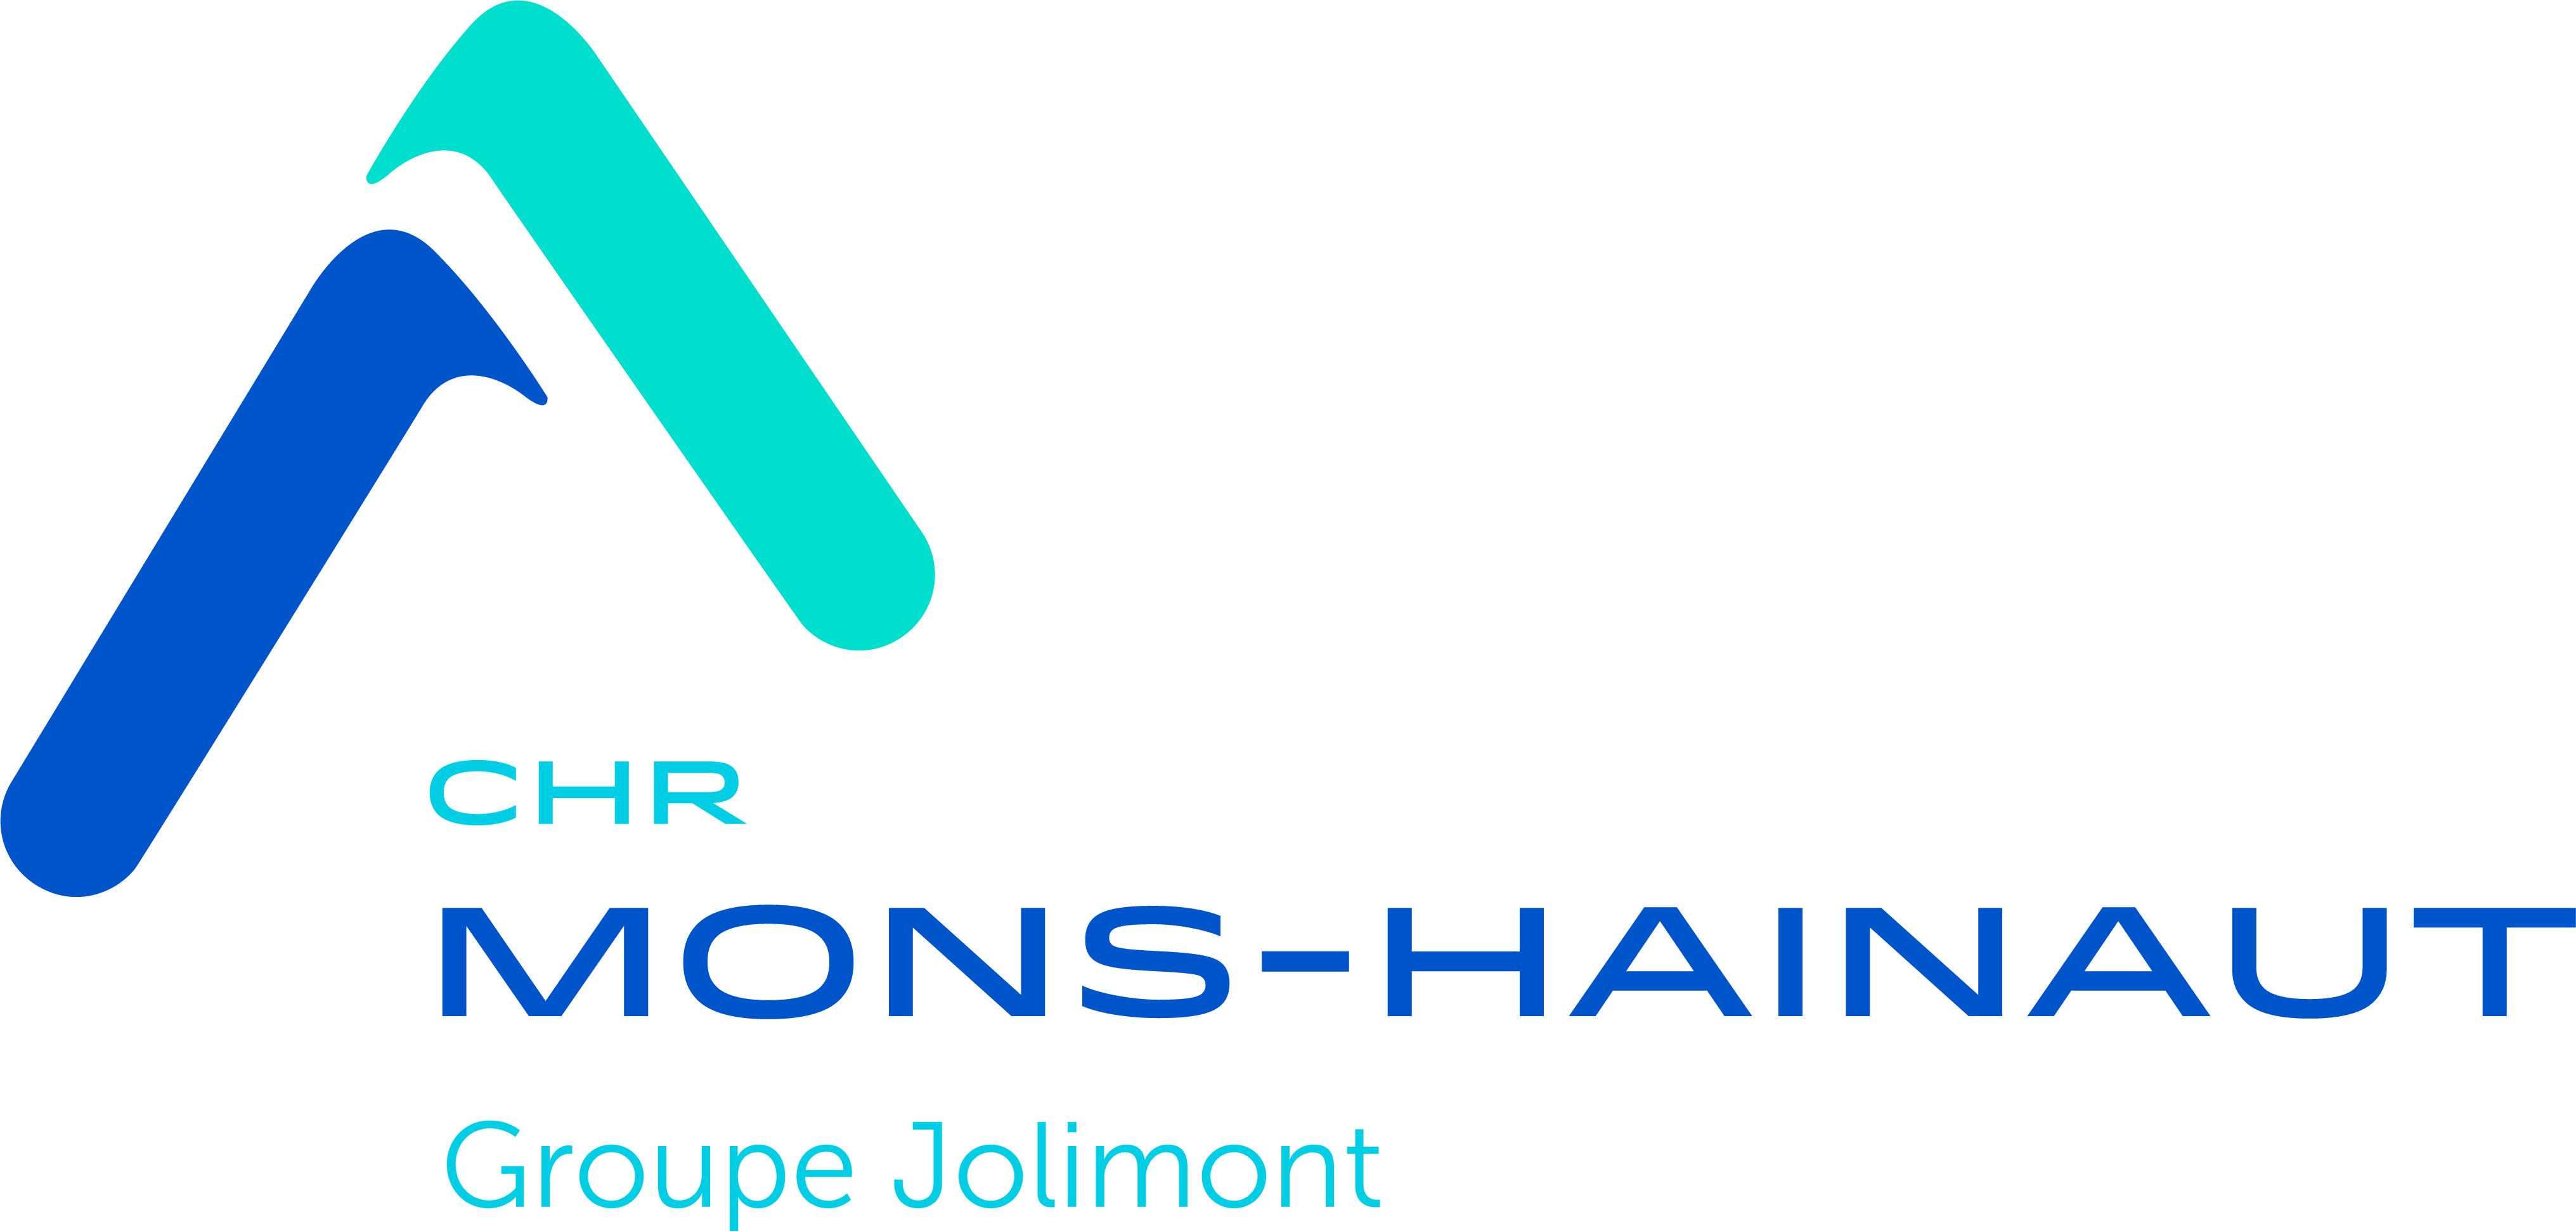 Centre Hospitalier Régional Mons-Hainaut